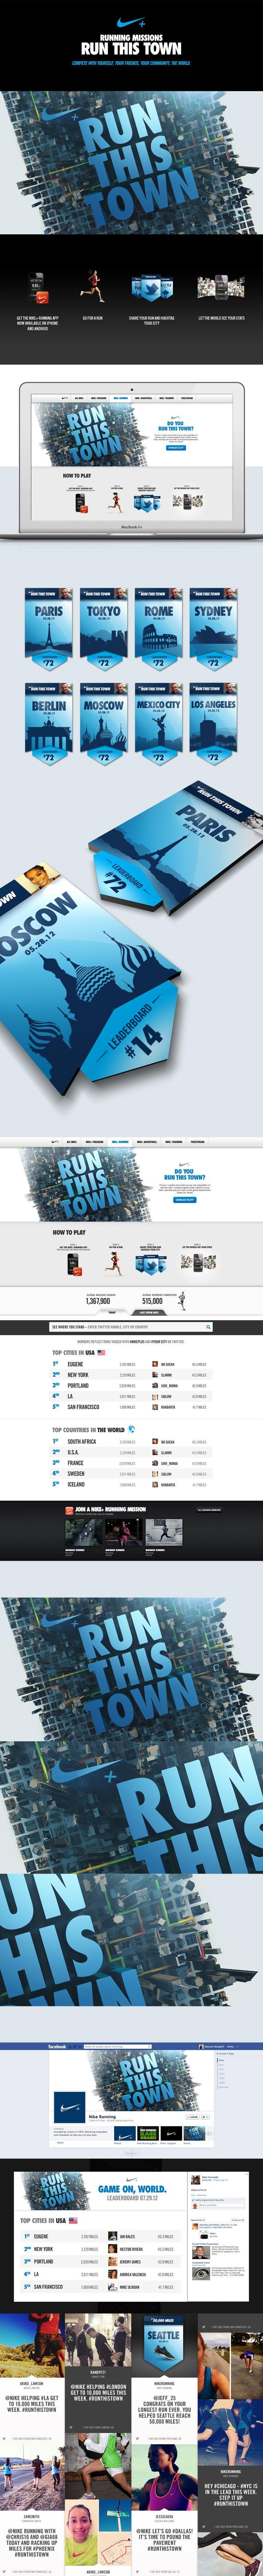 Nike+ Run This Town // on Behance // by Rasmus Wangelin & Adam Boyette https://www.behance.net/gallery/Nike-Run-This-Town/4954597